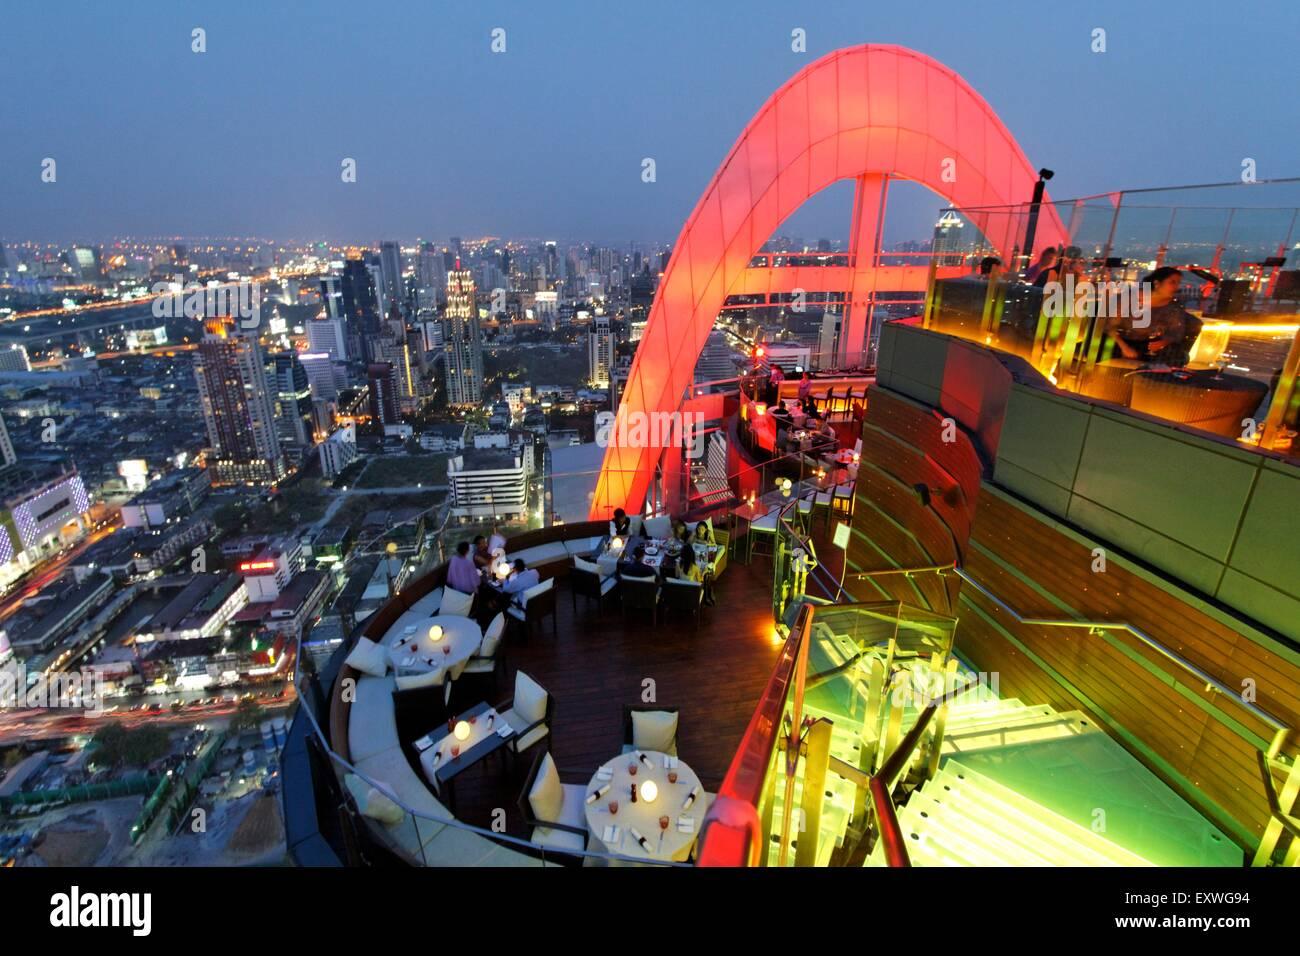 Red Sky Rooftop Bar, Centara Grand, Bangkok, Thailand, Asia - Stock Image